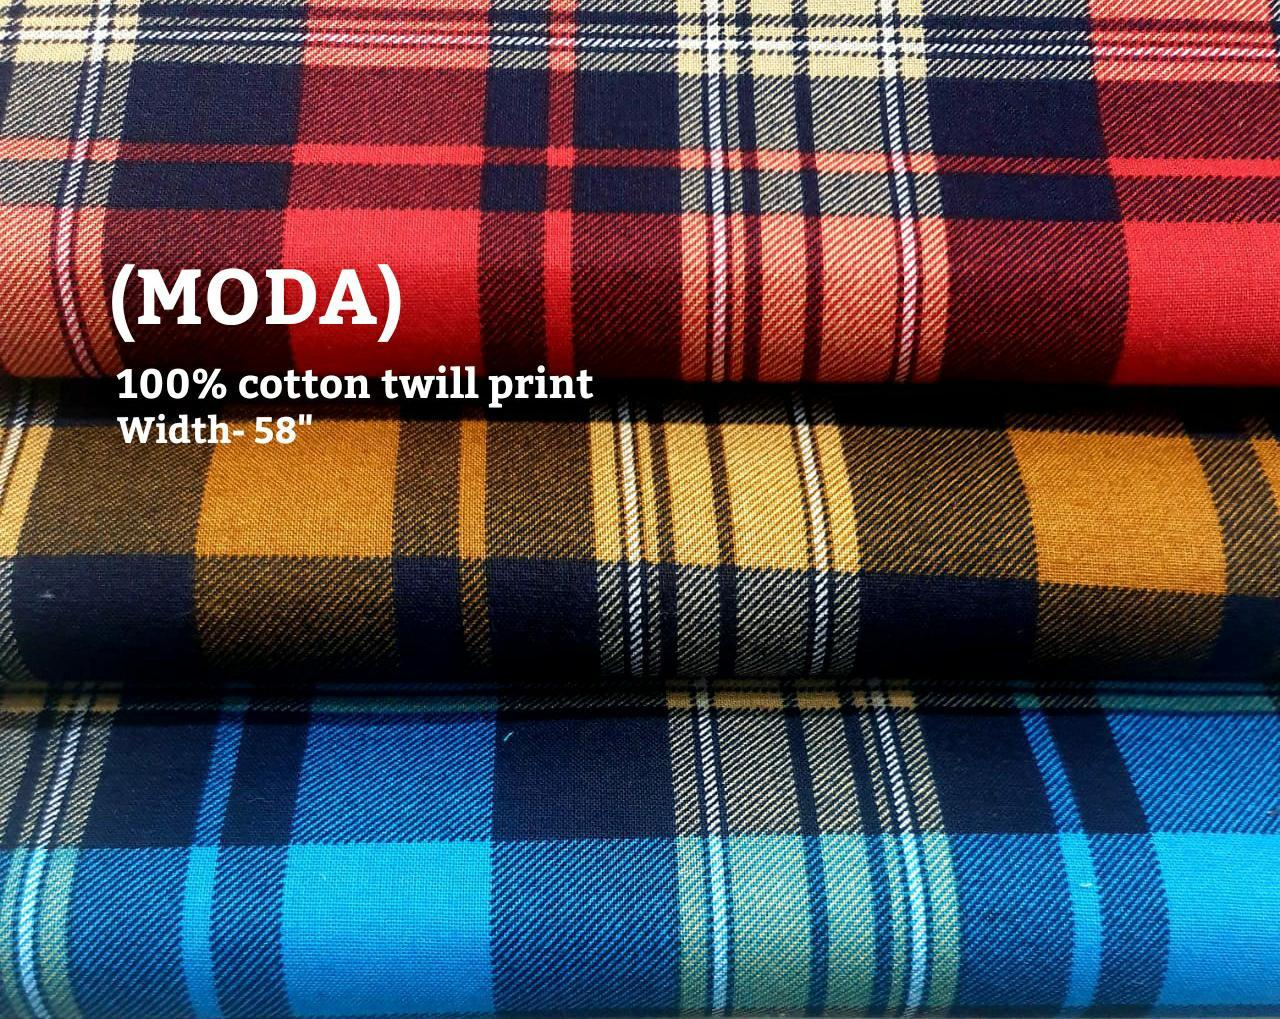 MODA 100% cotton twill print